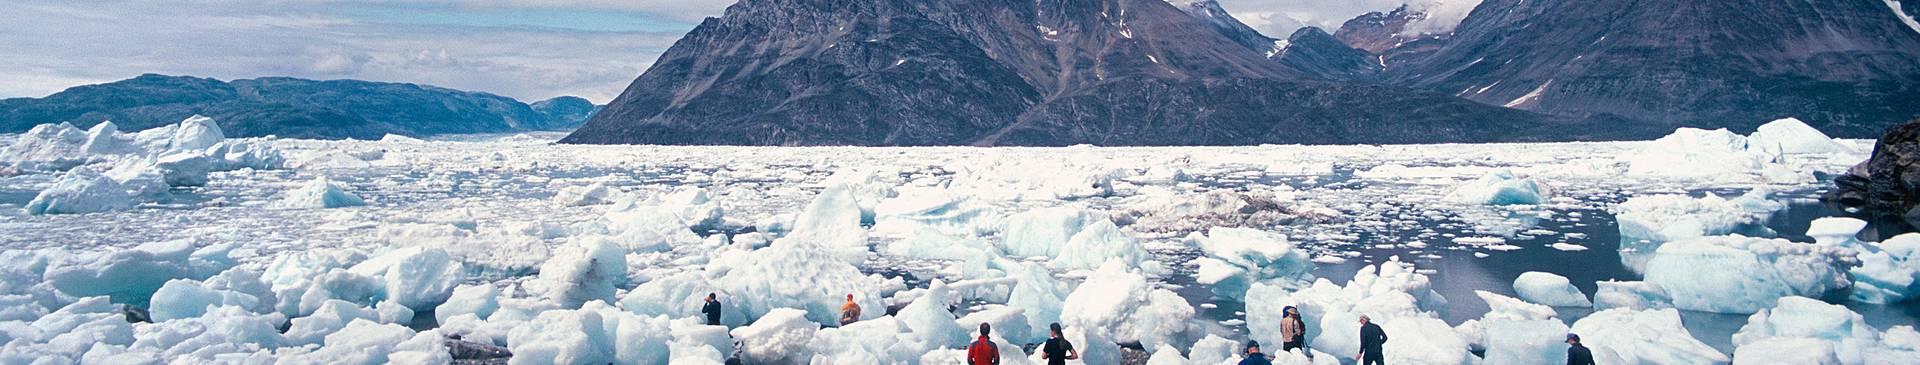 Voyage en groupe au Groenland